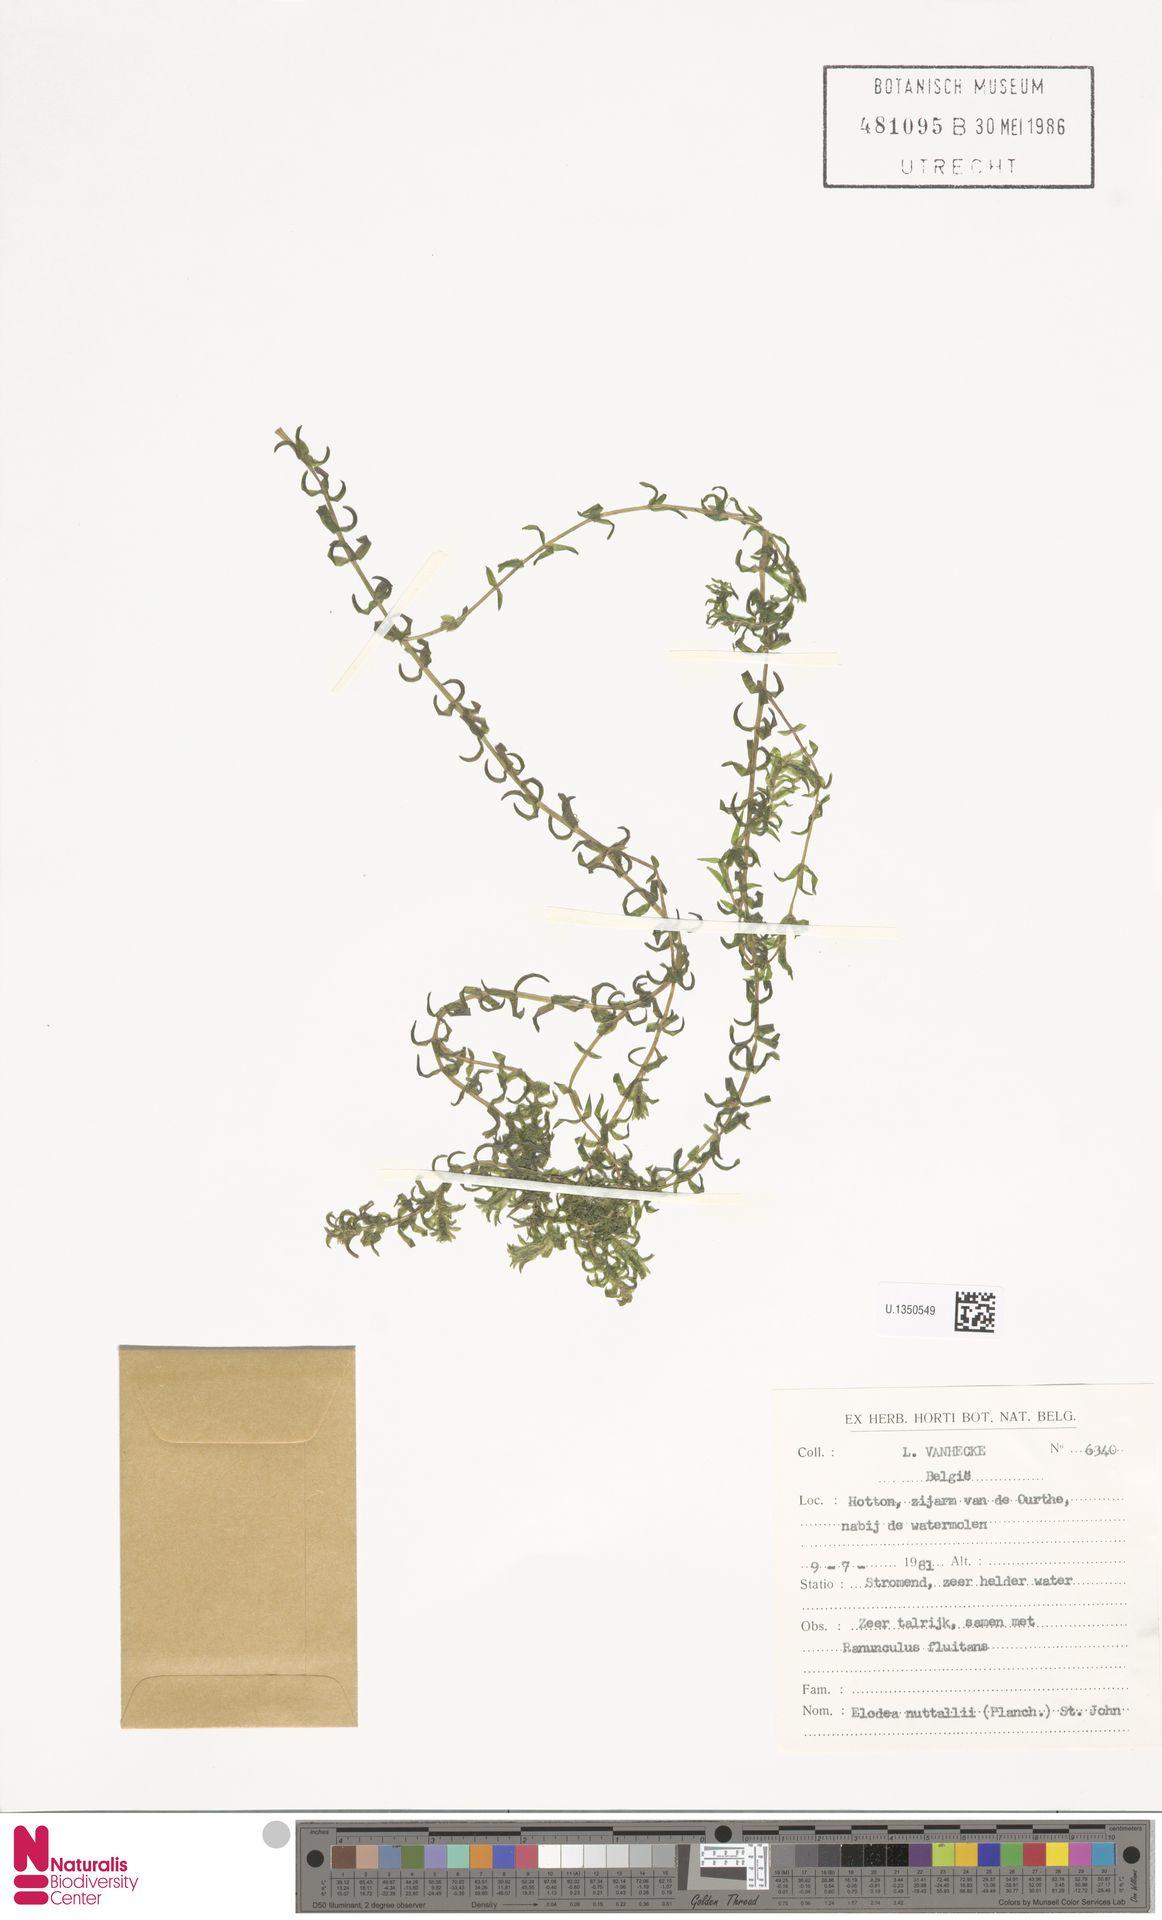 U.1350549 | Elodea nuttallii (Planch.) H.St.John